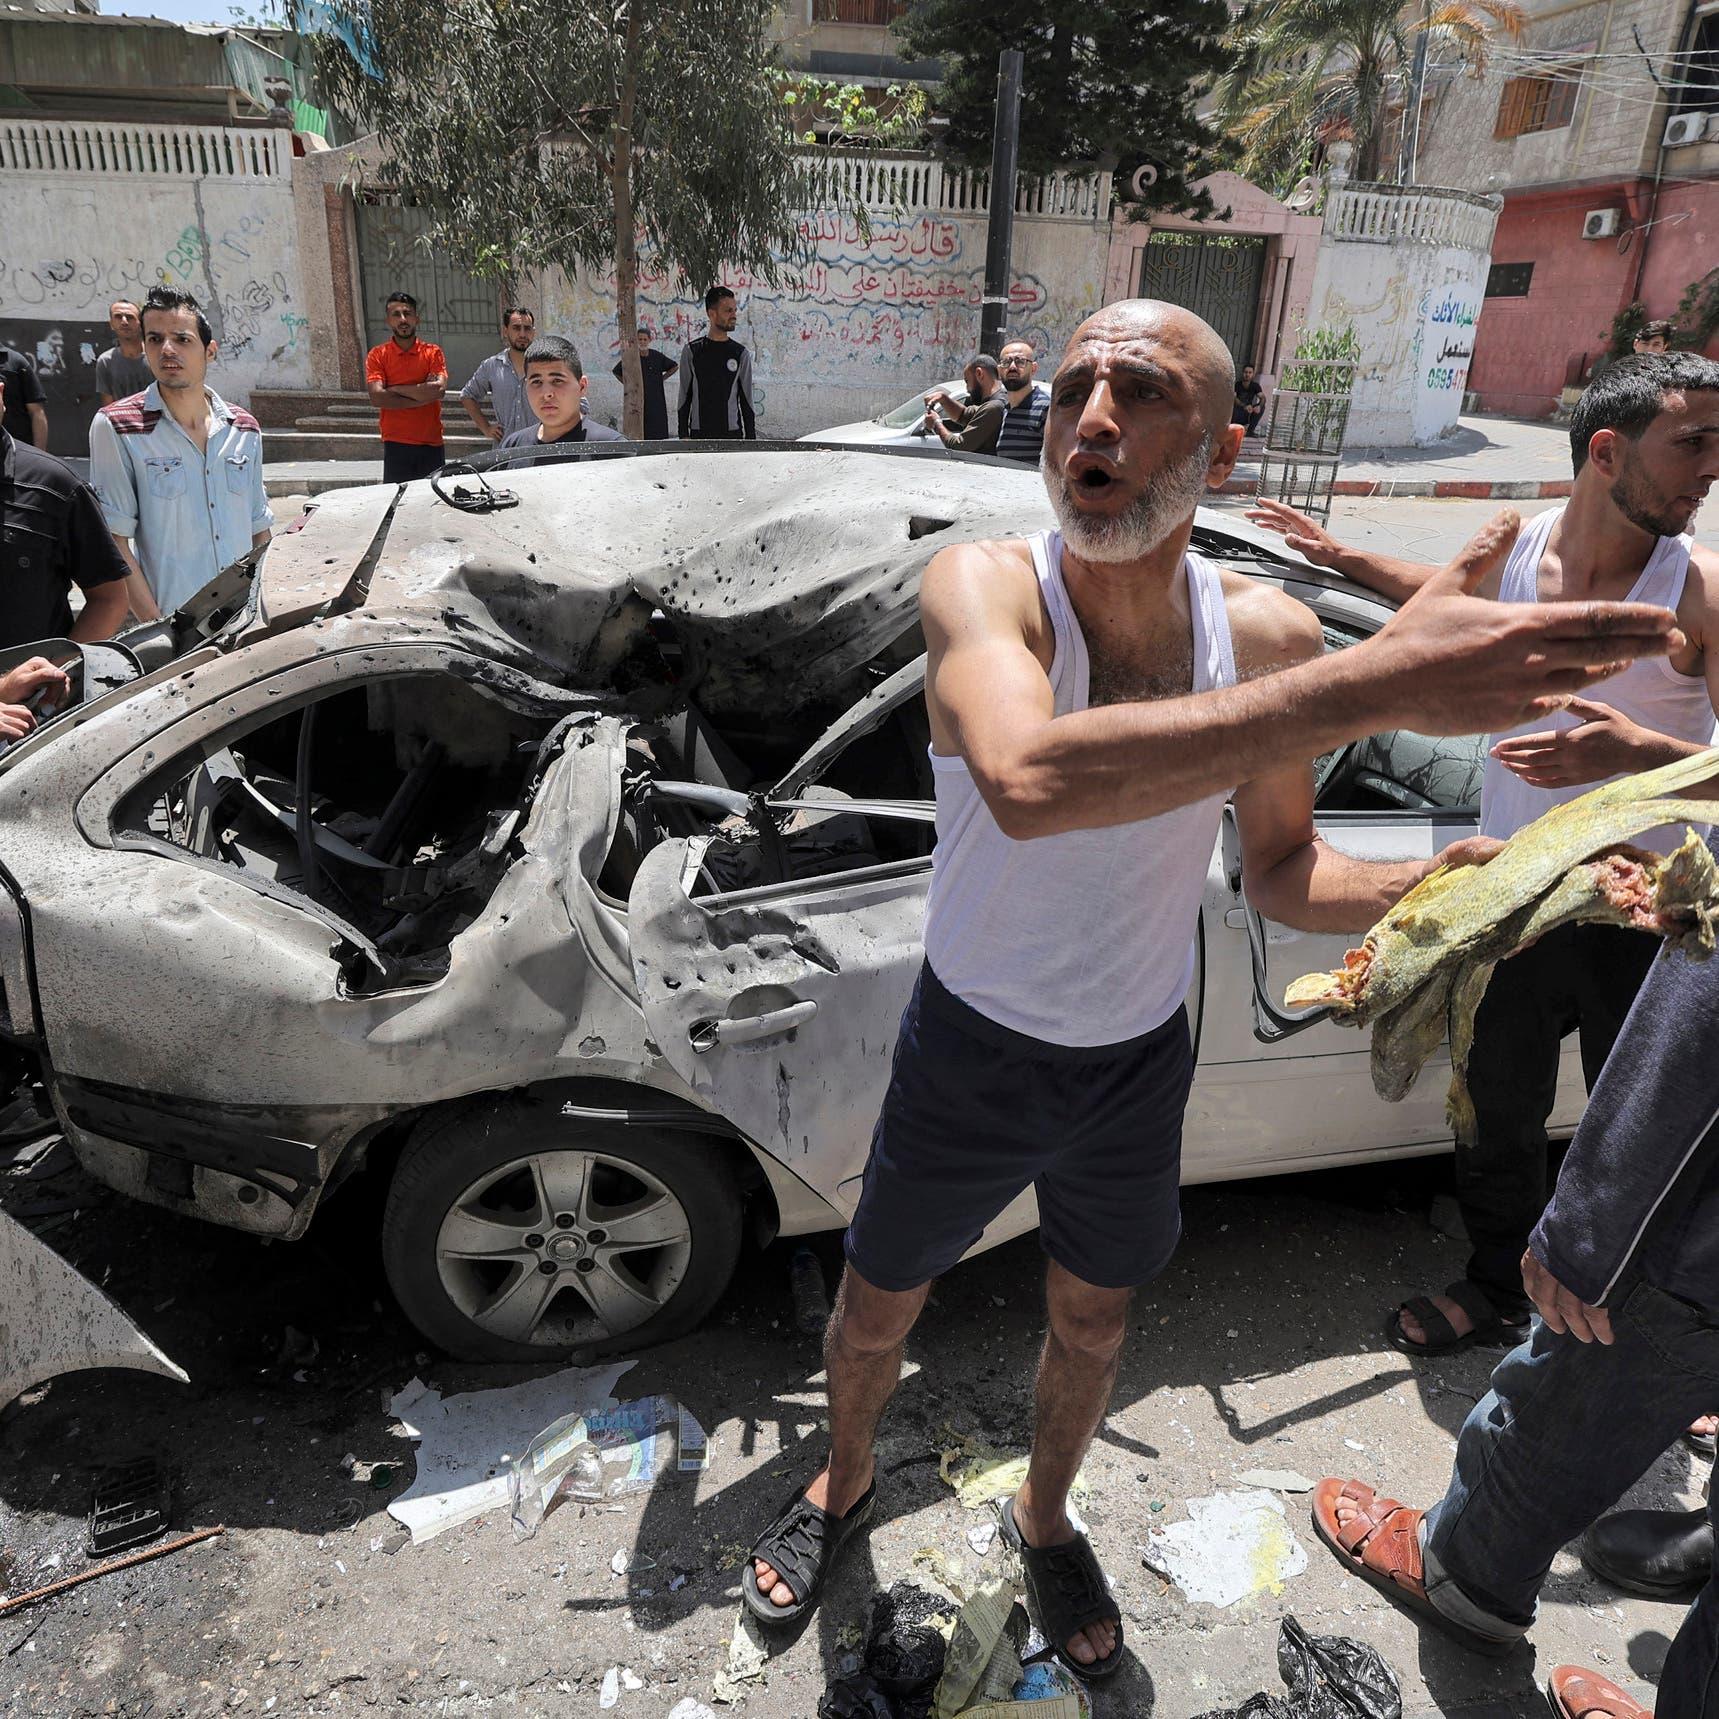 Israeli airstrikes kill 115 Palestinians in Gaza, including 27 children, 11 women